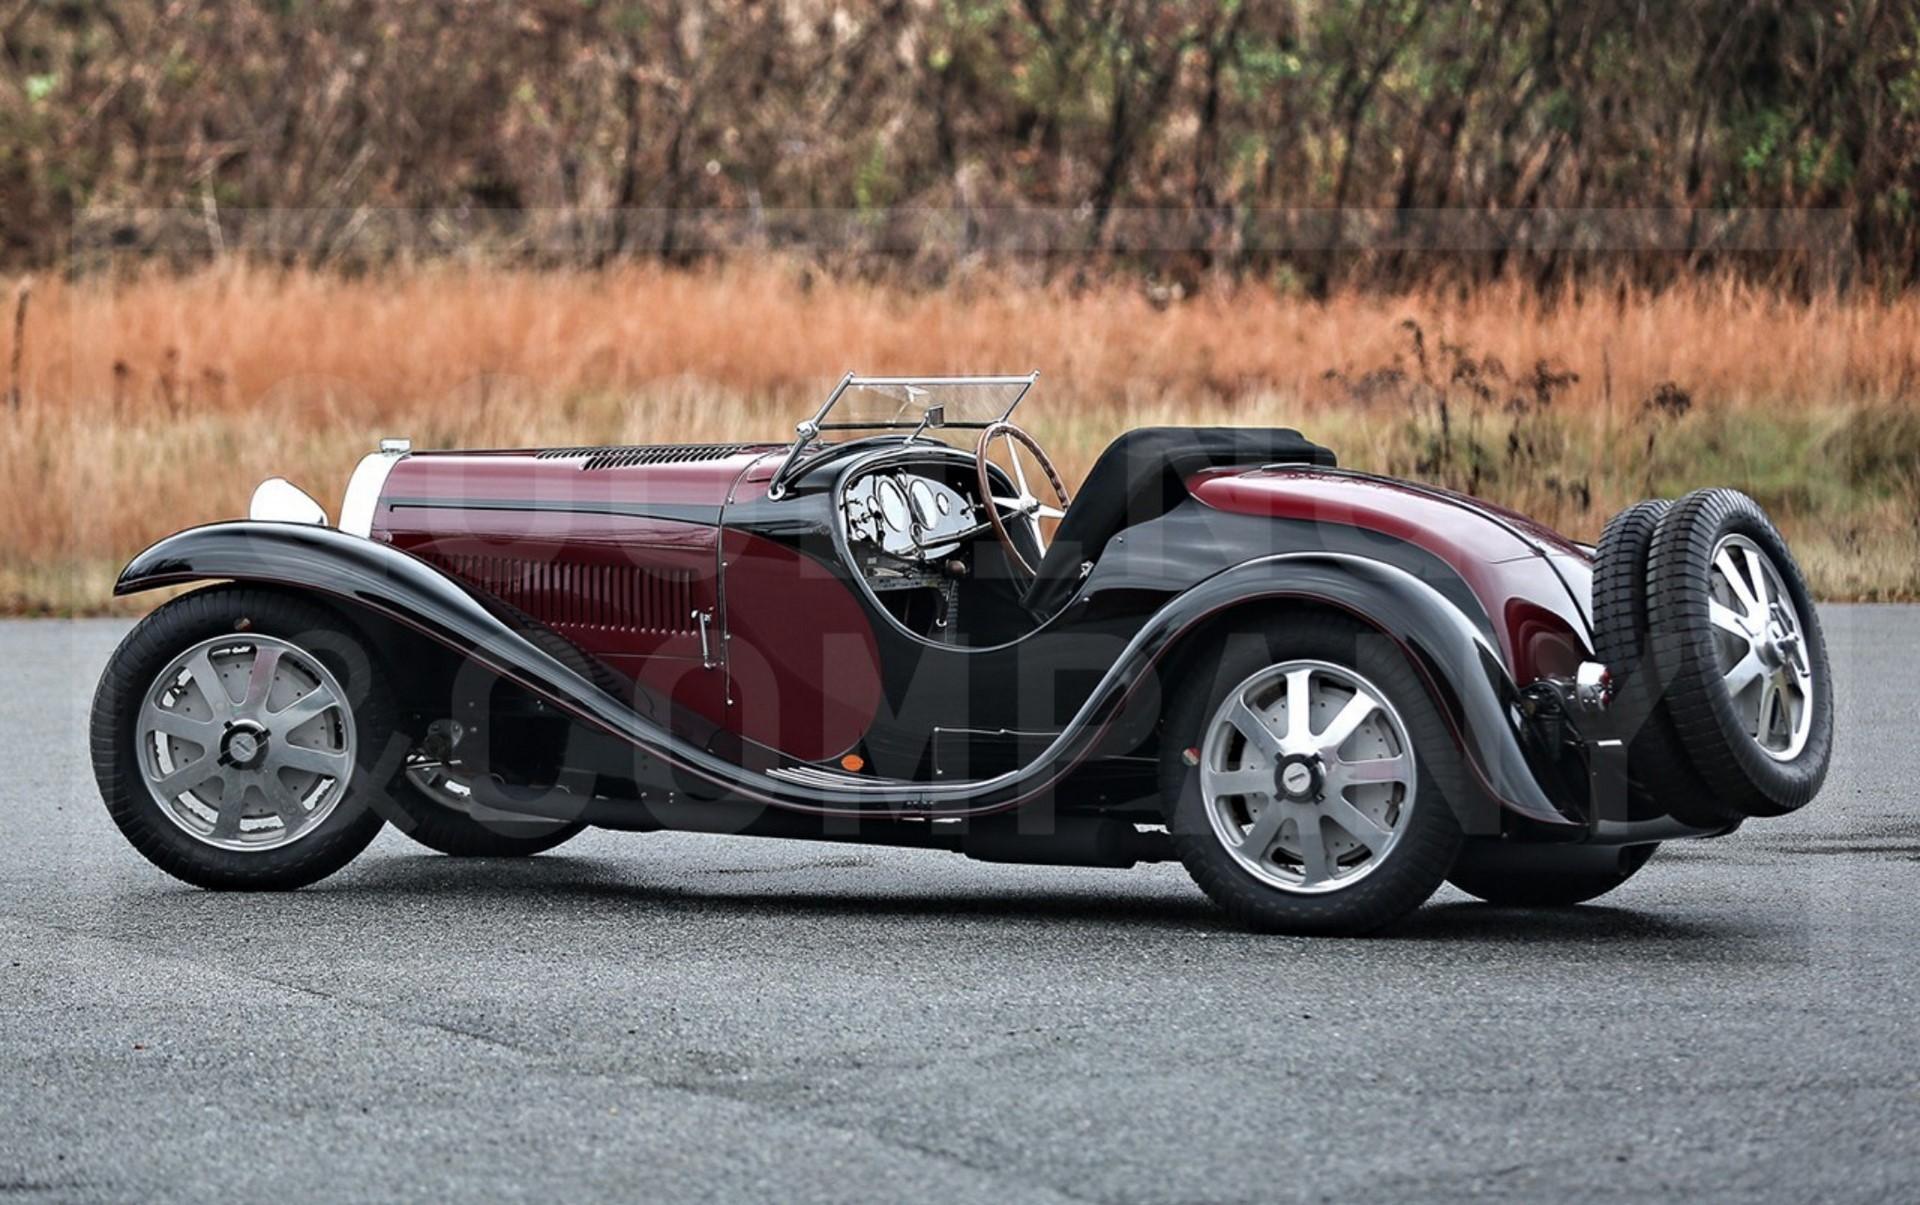 1931 Bugatti Type 55 ford sale (2)